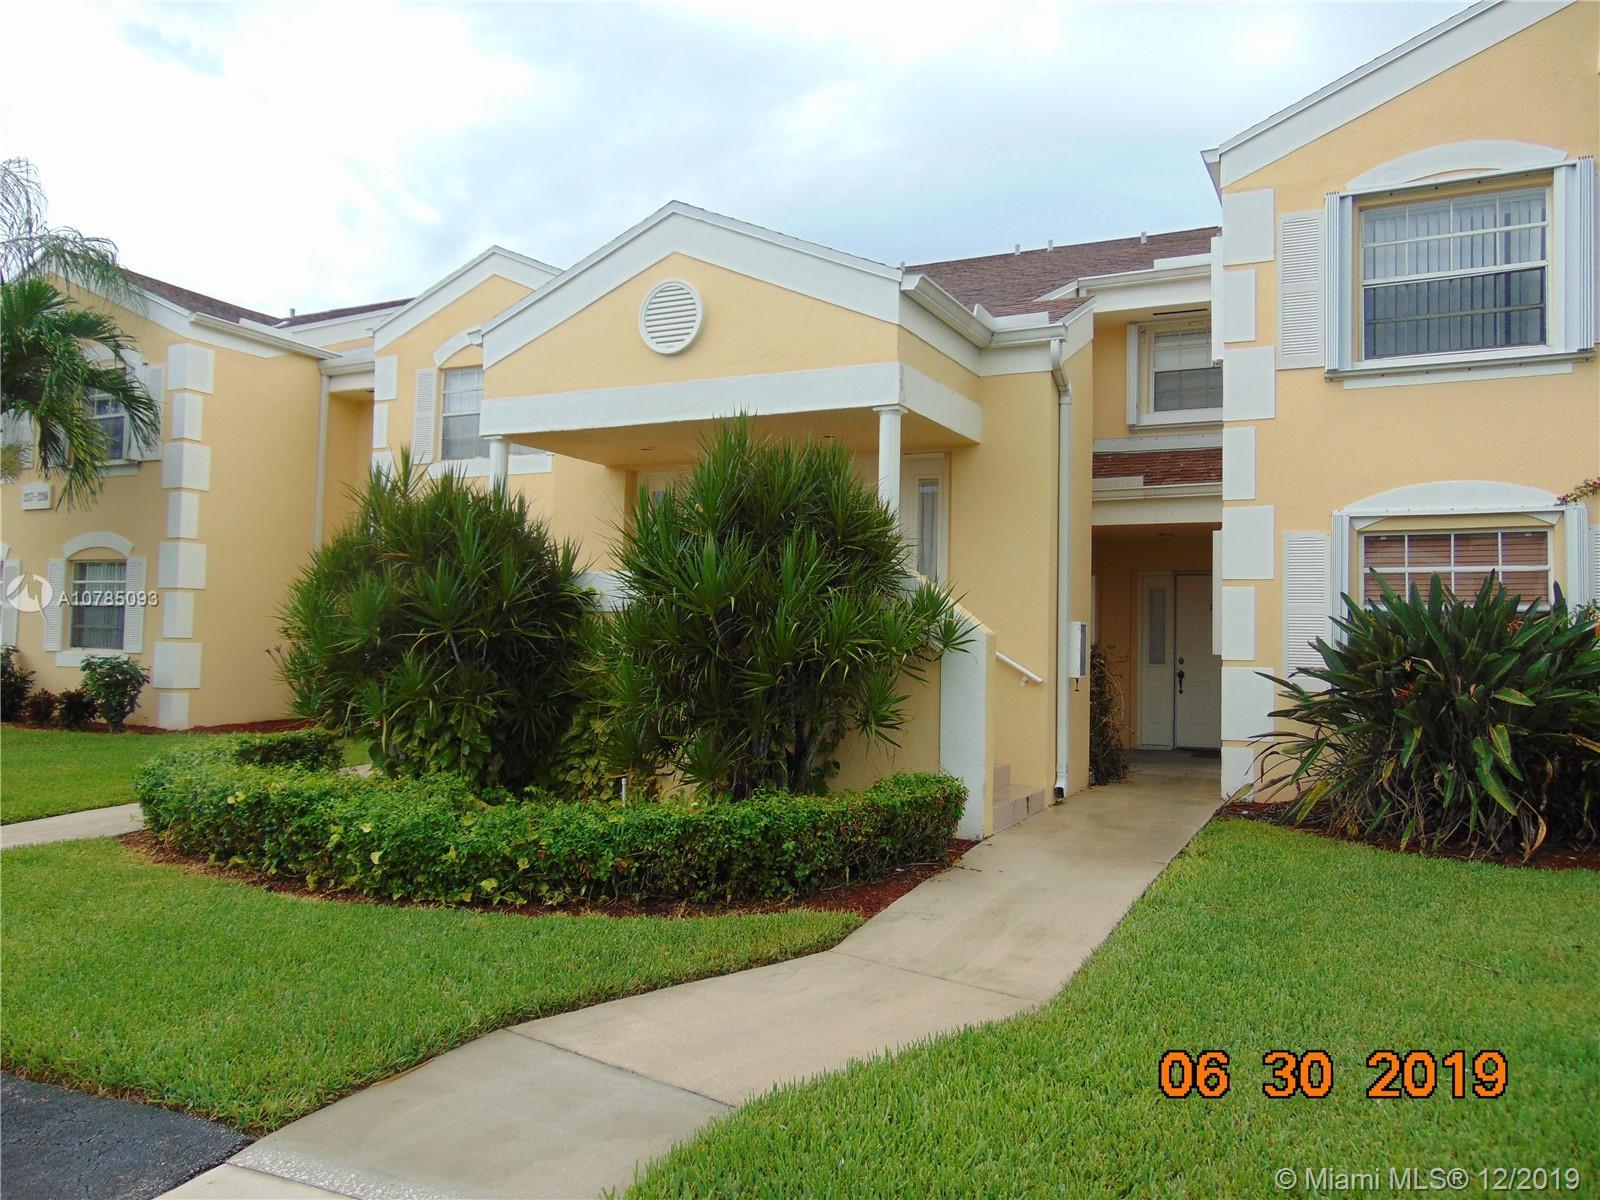 2284 SE 27th Dr #204-G, Homestead, FL 33035 - Homestead, FL real estate listing